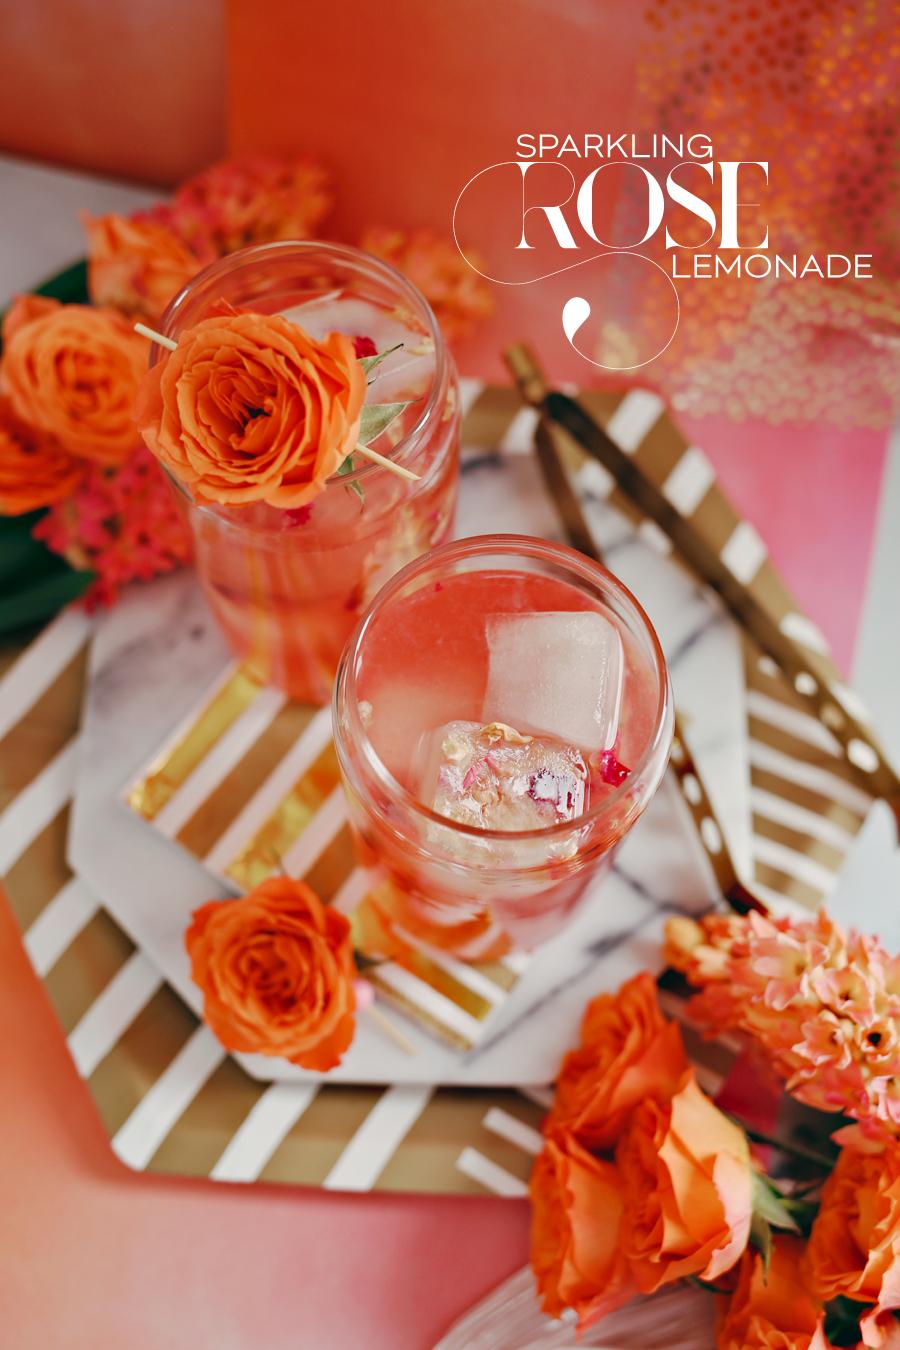 Sparkling-Rose-Lemonade-Recipe-Dine-X-Design.jpg